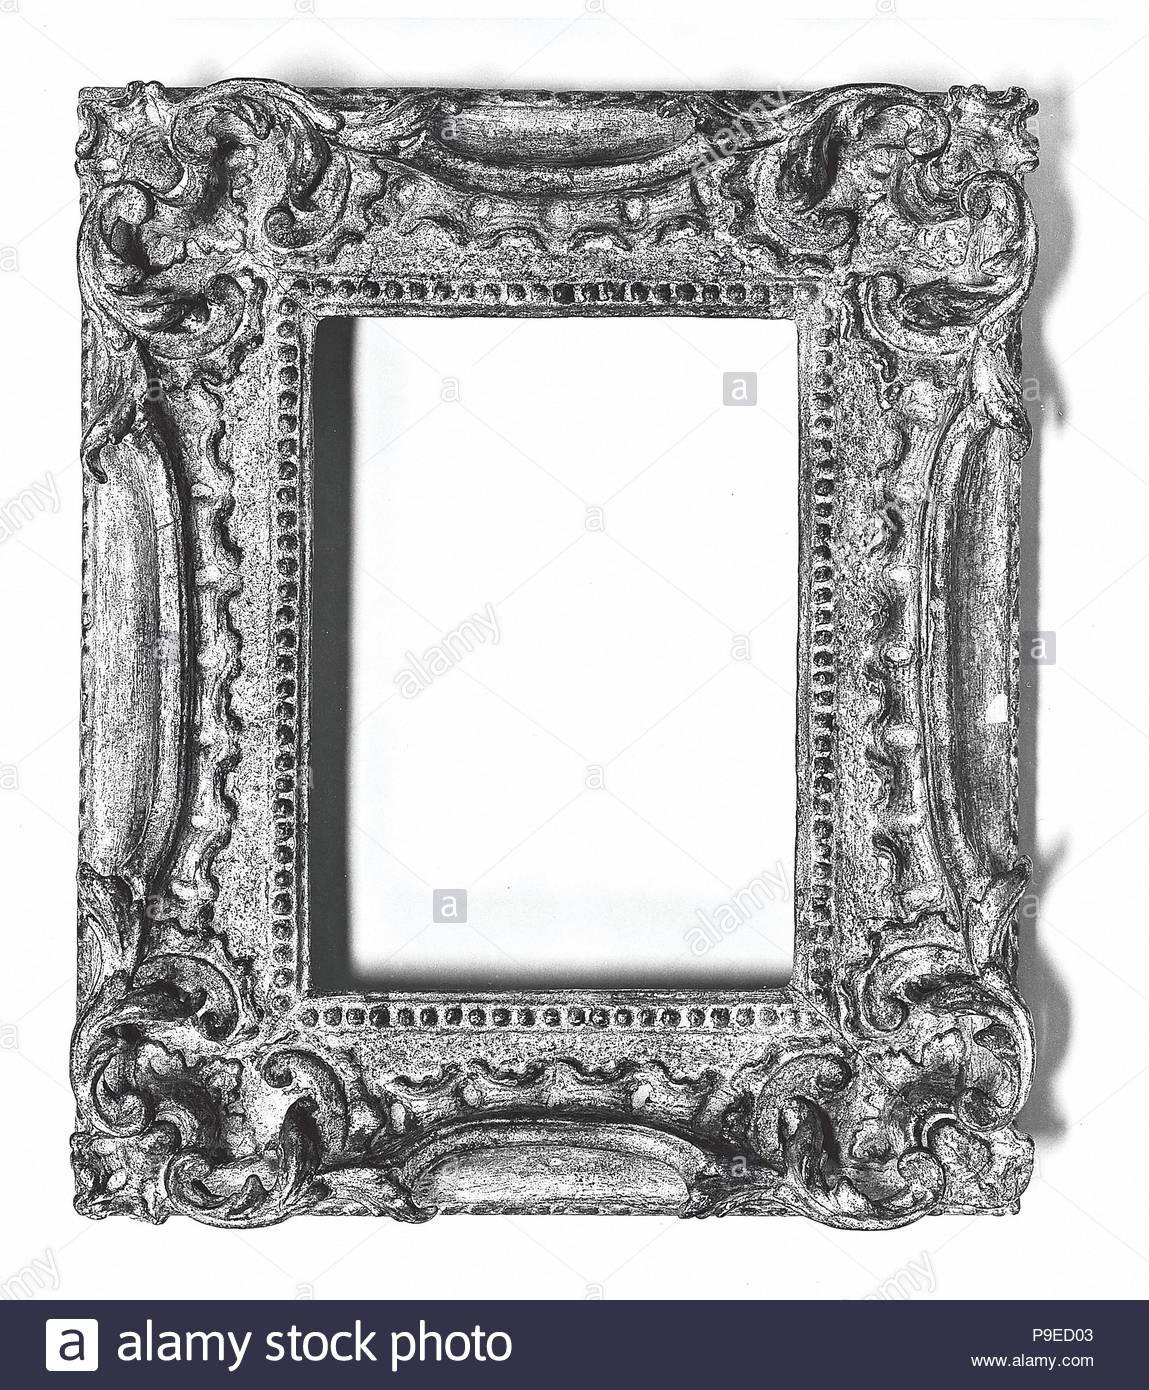 Rococo Frame Ca 1765 British Pine 312 X 255 185 X 13 20 X